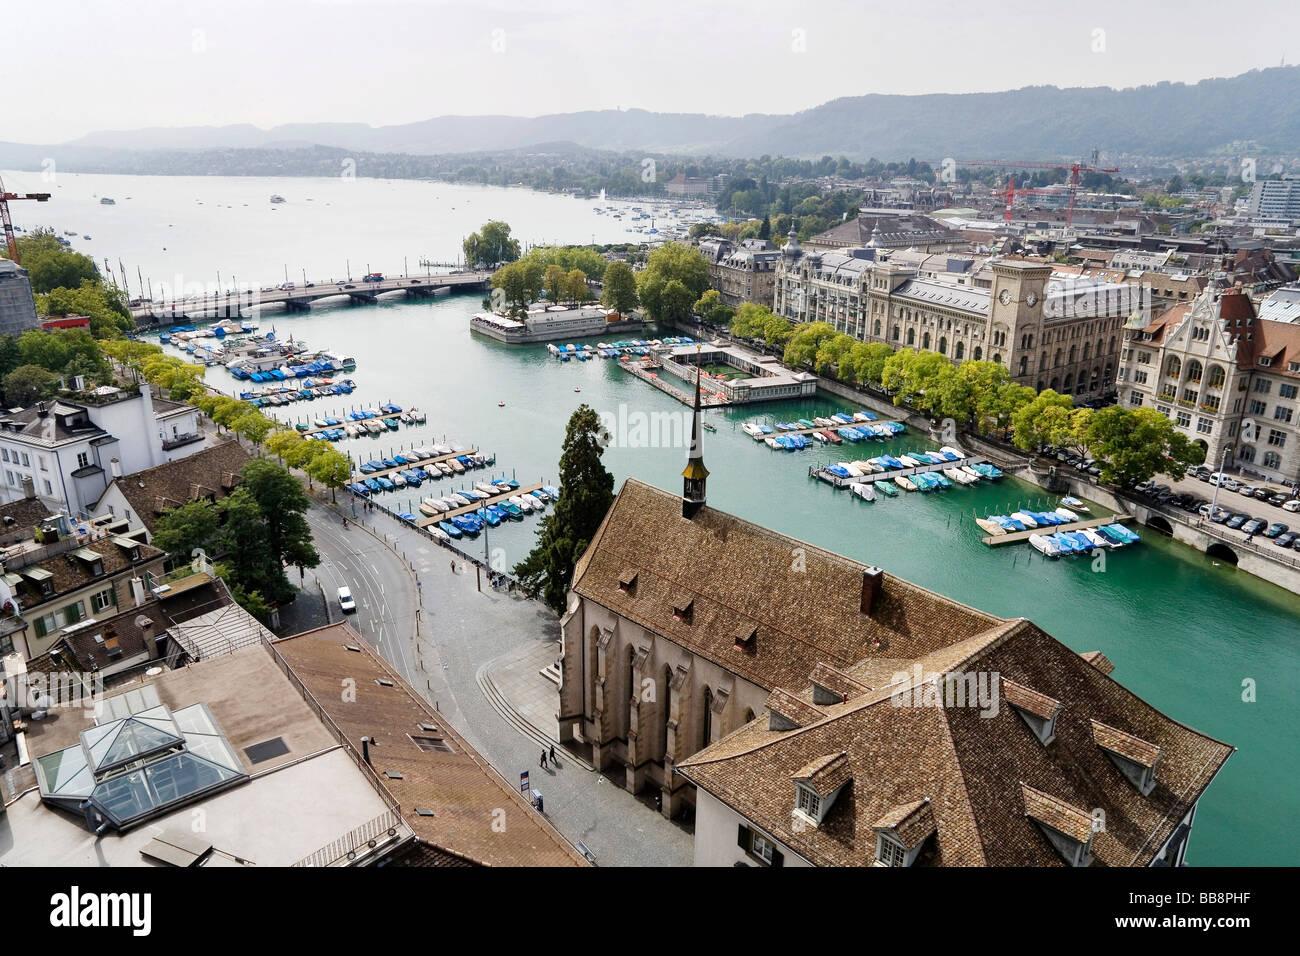 View of the historic centre of Zurich, Wasserkirche Church and Lake Zurich, Switzerland, Europe - Stock Image